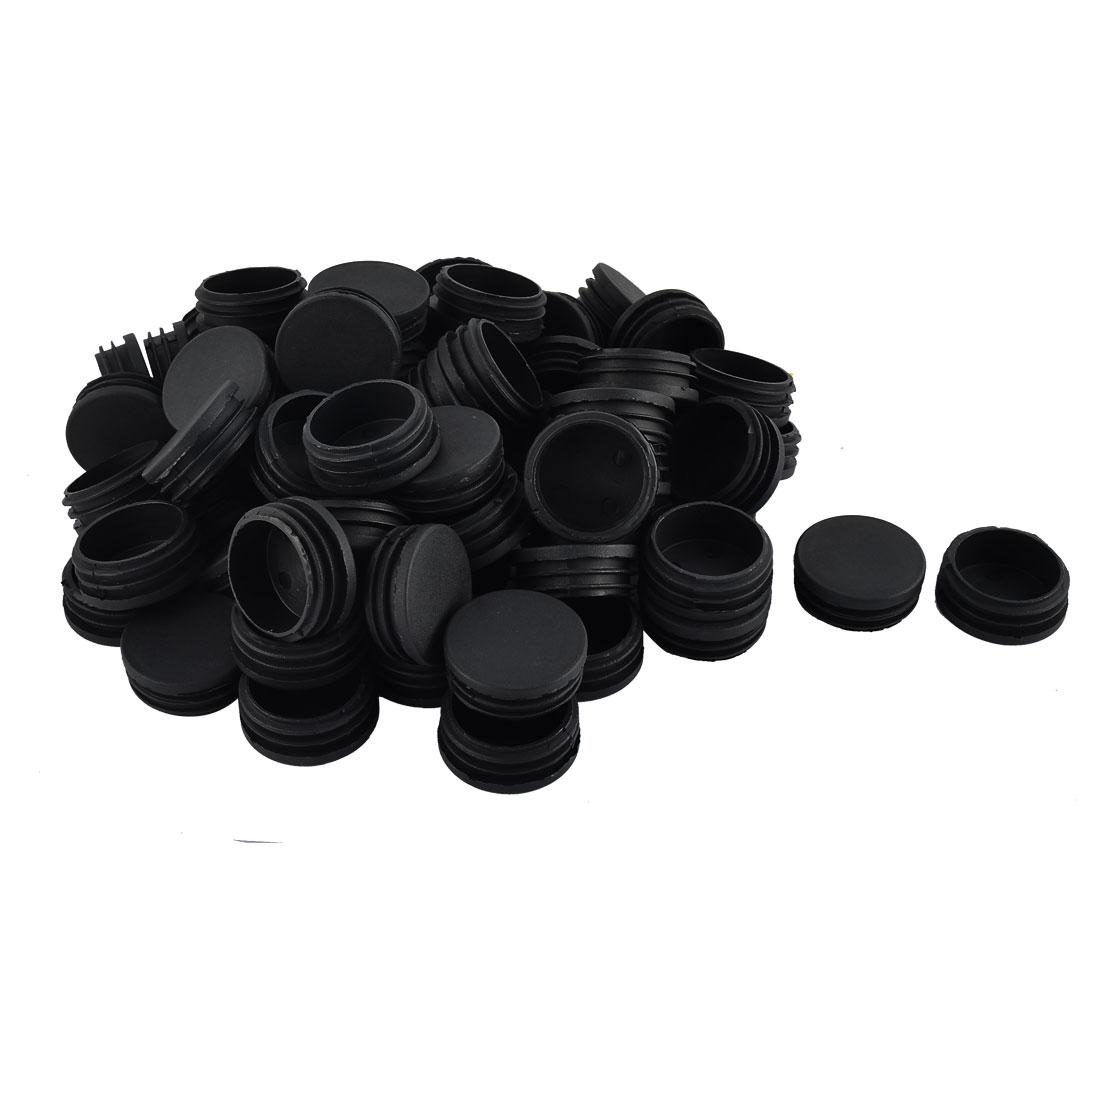 Furniture Table Legs Plastic Round Tube Pipe Insert Cover Black 45mm Dia 70pcs